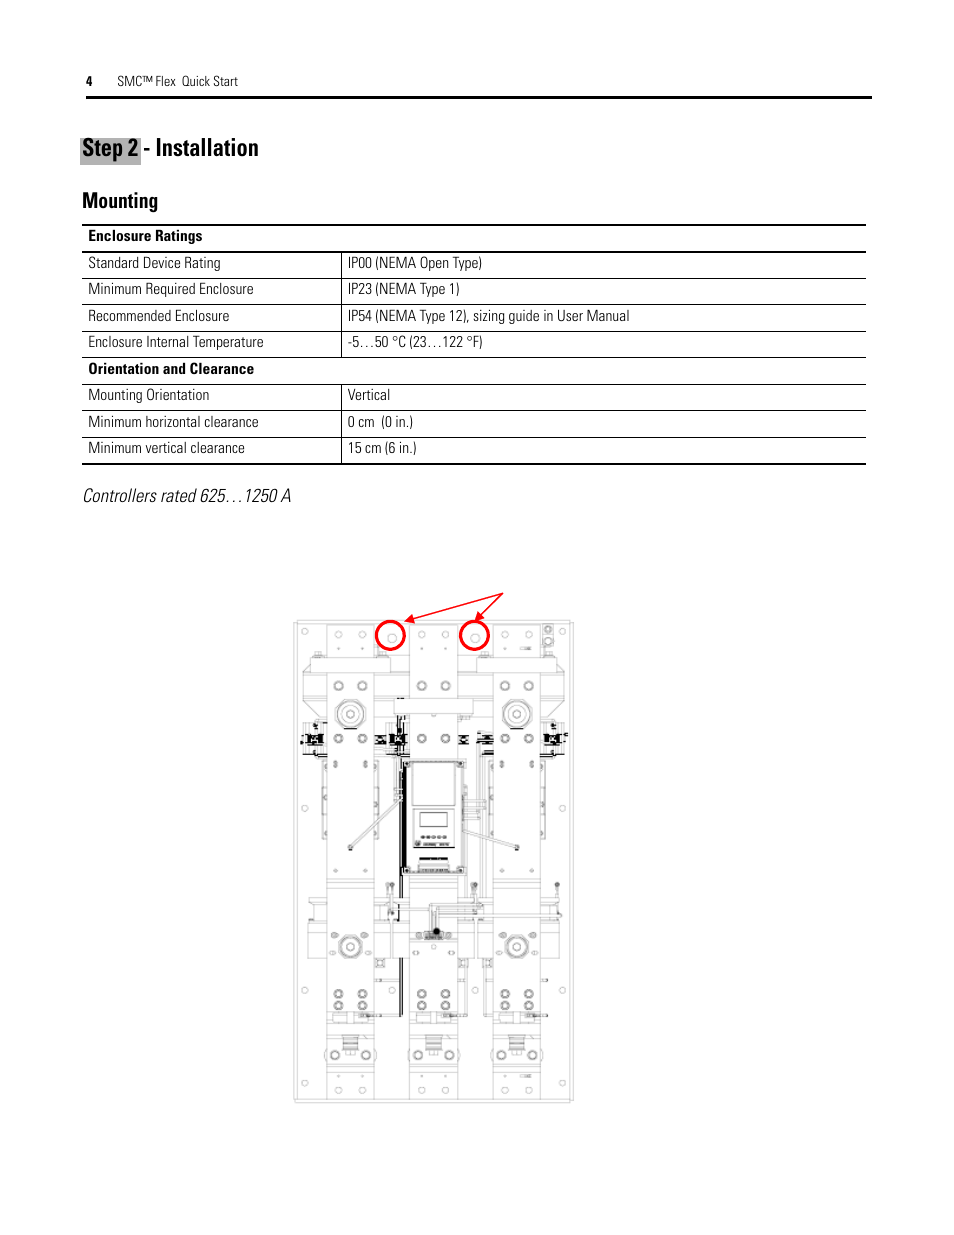 Smc Flex 150 Wiring Diagram Schematics Franklin Electric Step 2 Installation Mounting Rockwell Automation